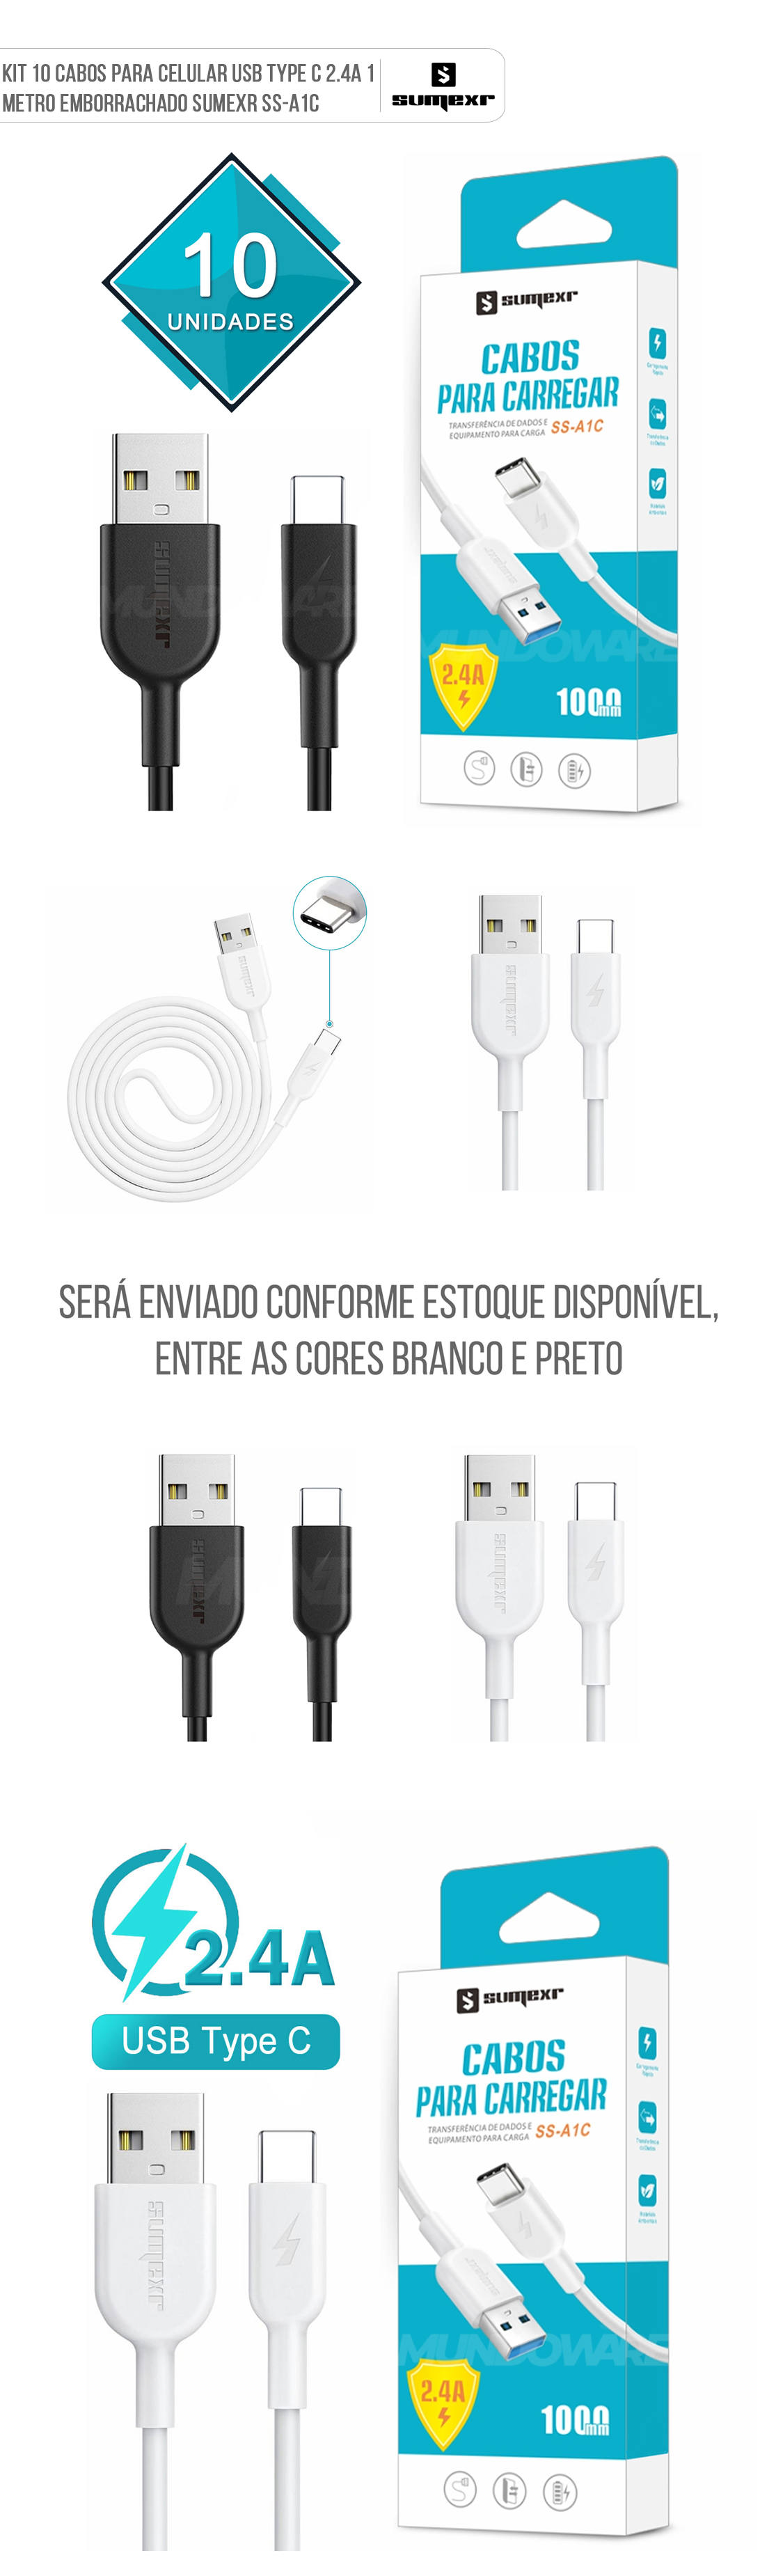 Kit com 10 Cabos USB Type-C 2.4A 1 Metro Emborrachado e Resistente Sumexr SS-A1C